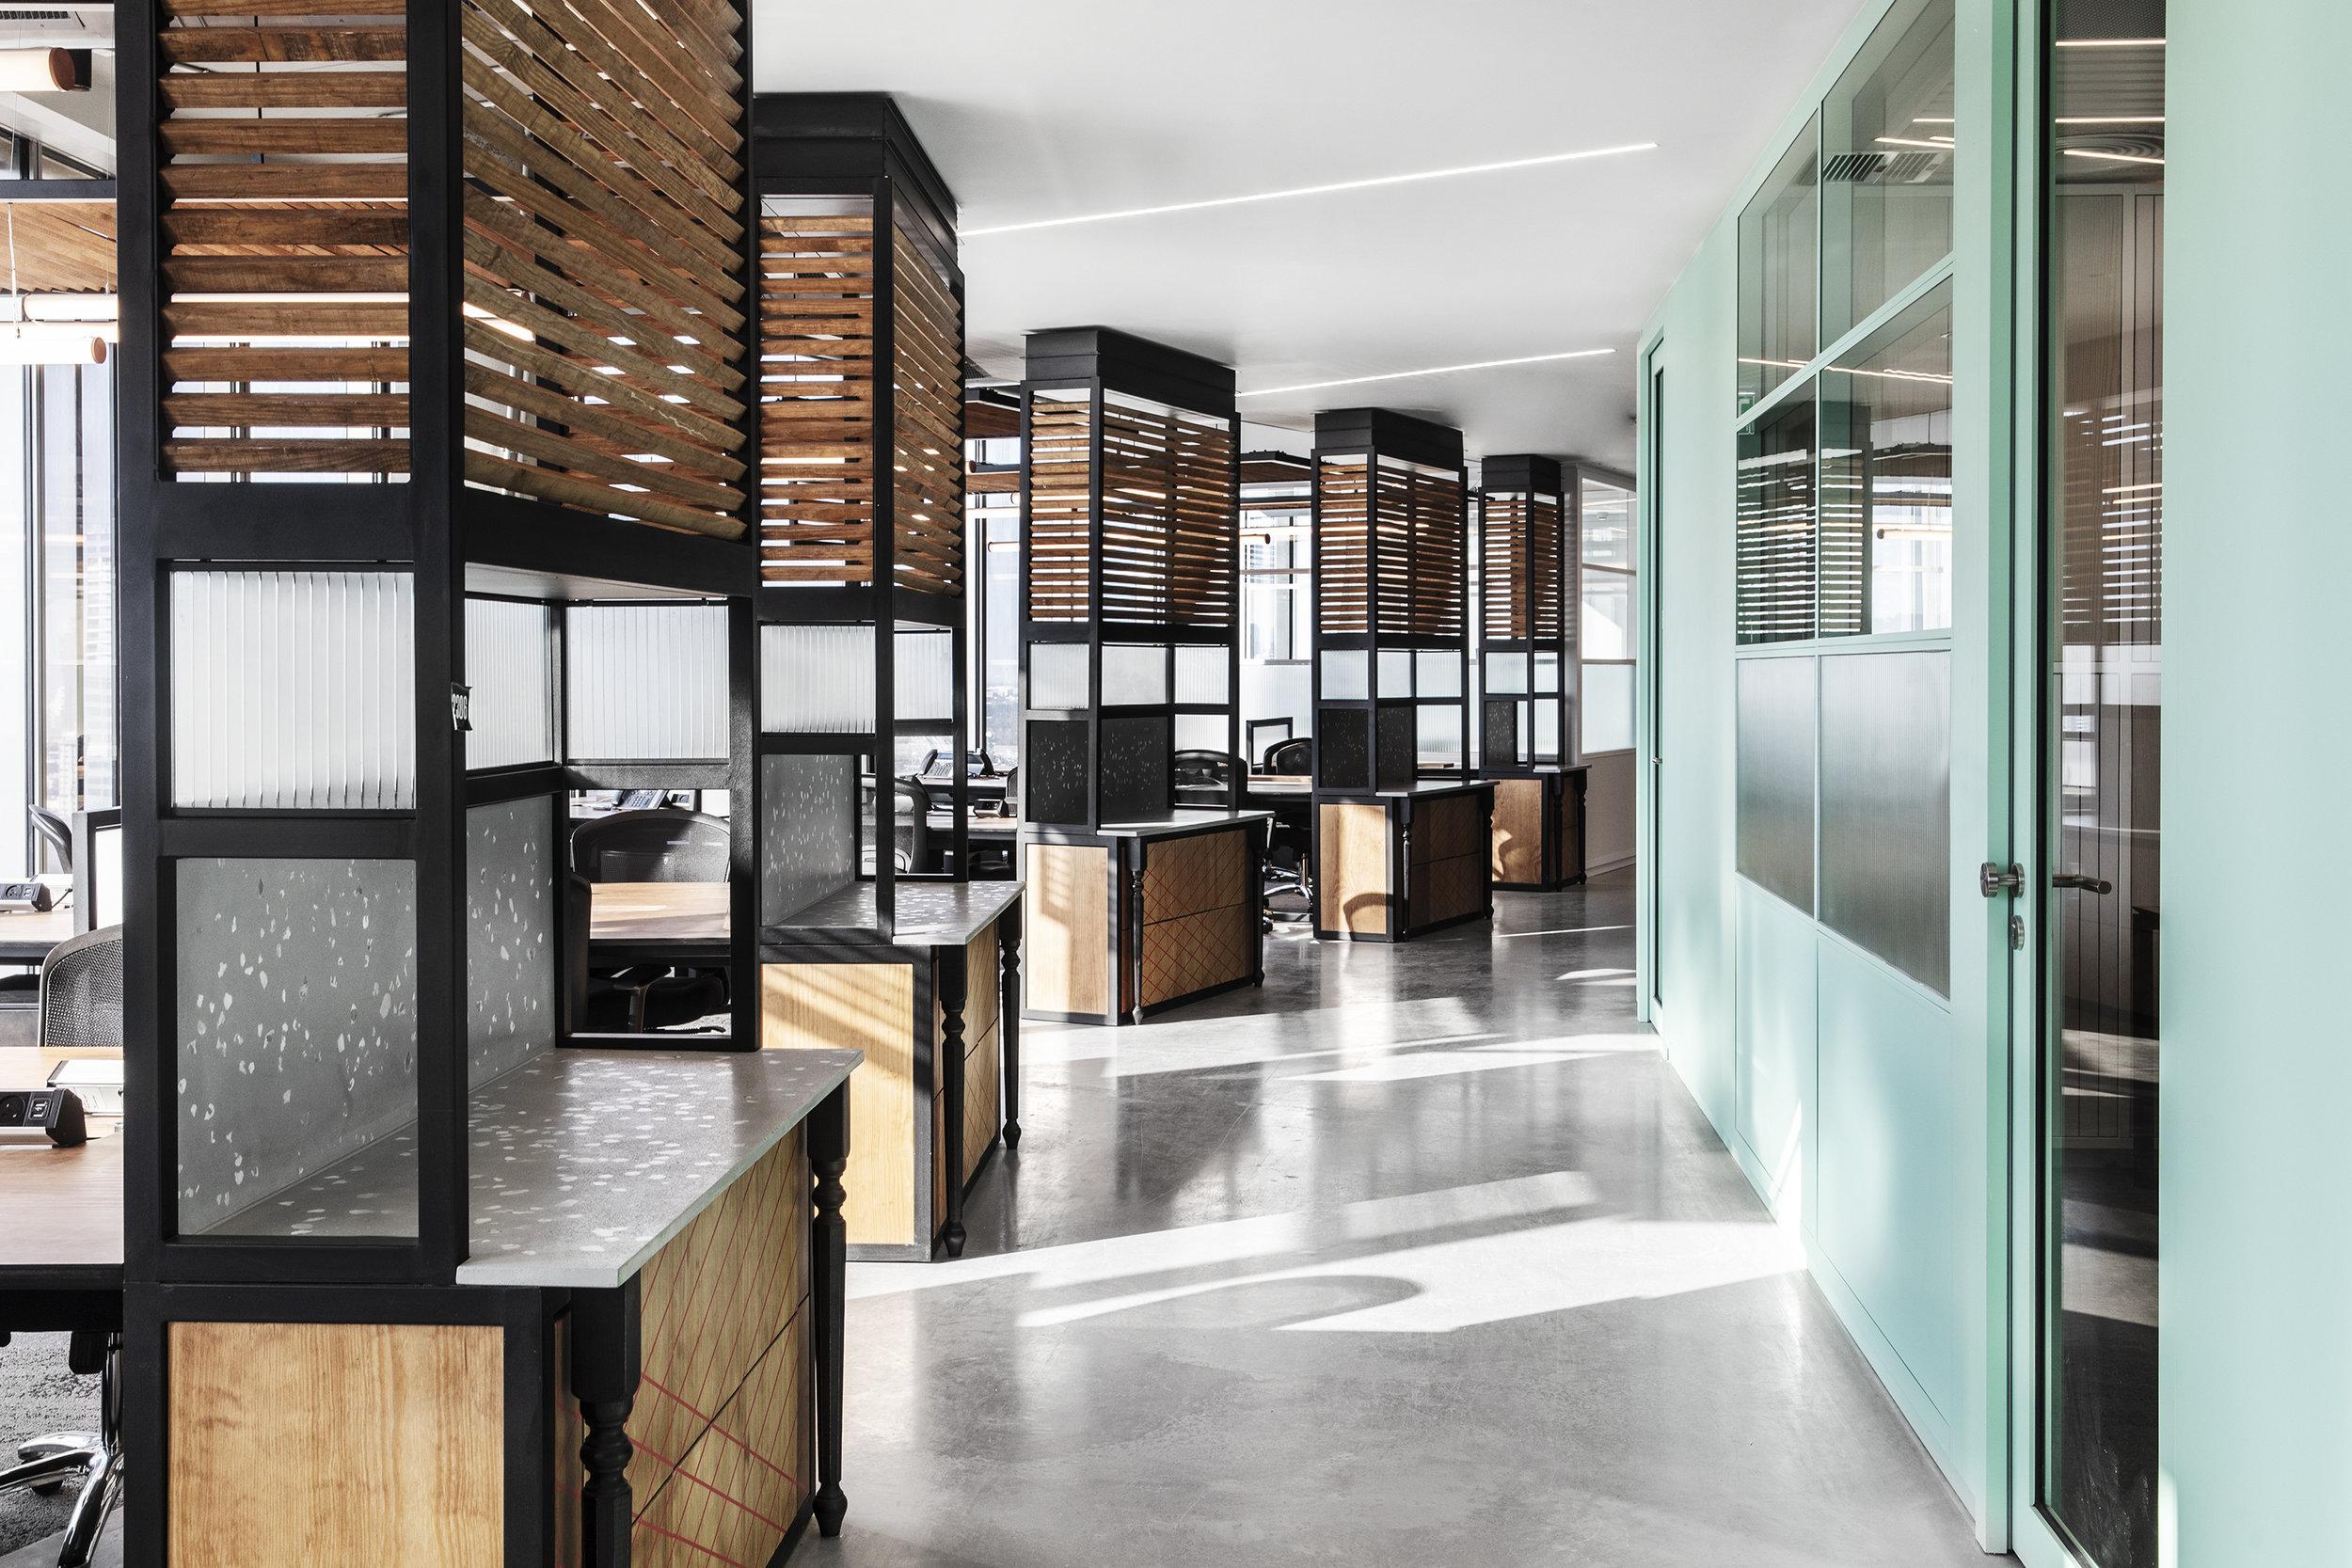 רואי דוד אדריכלות - אדריכל - נטורל אינטליג'נס - ROY DAVID - ARCHITECTURE - ARCHITECT - NI (107).jpg